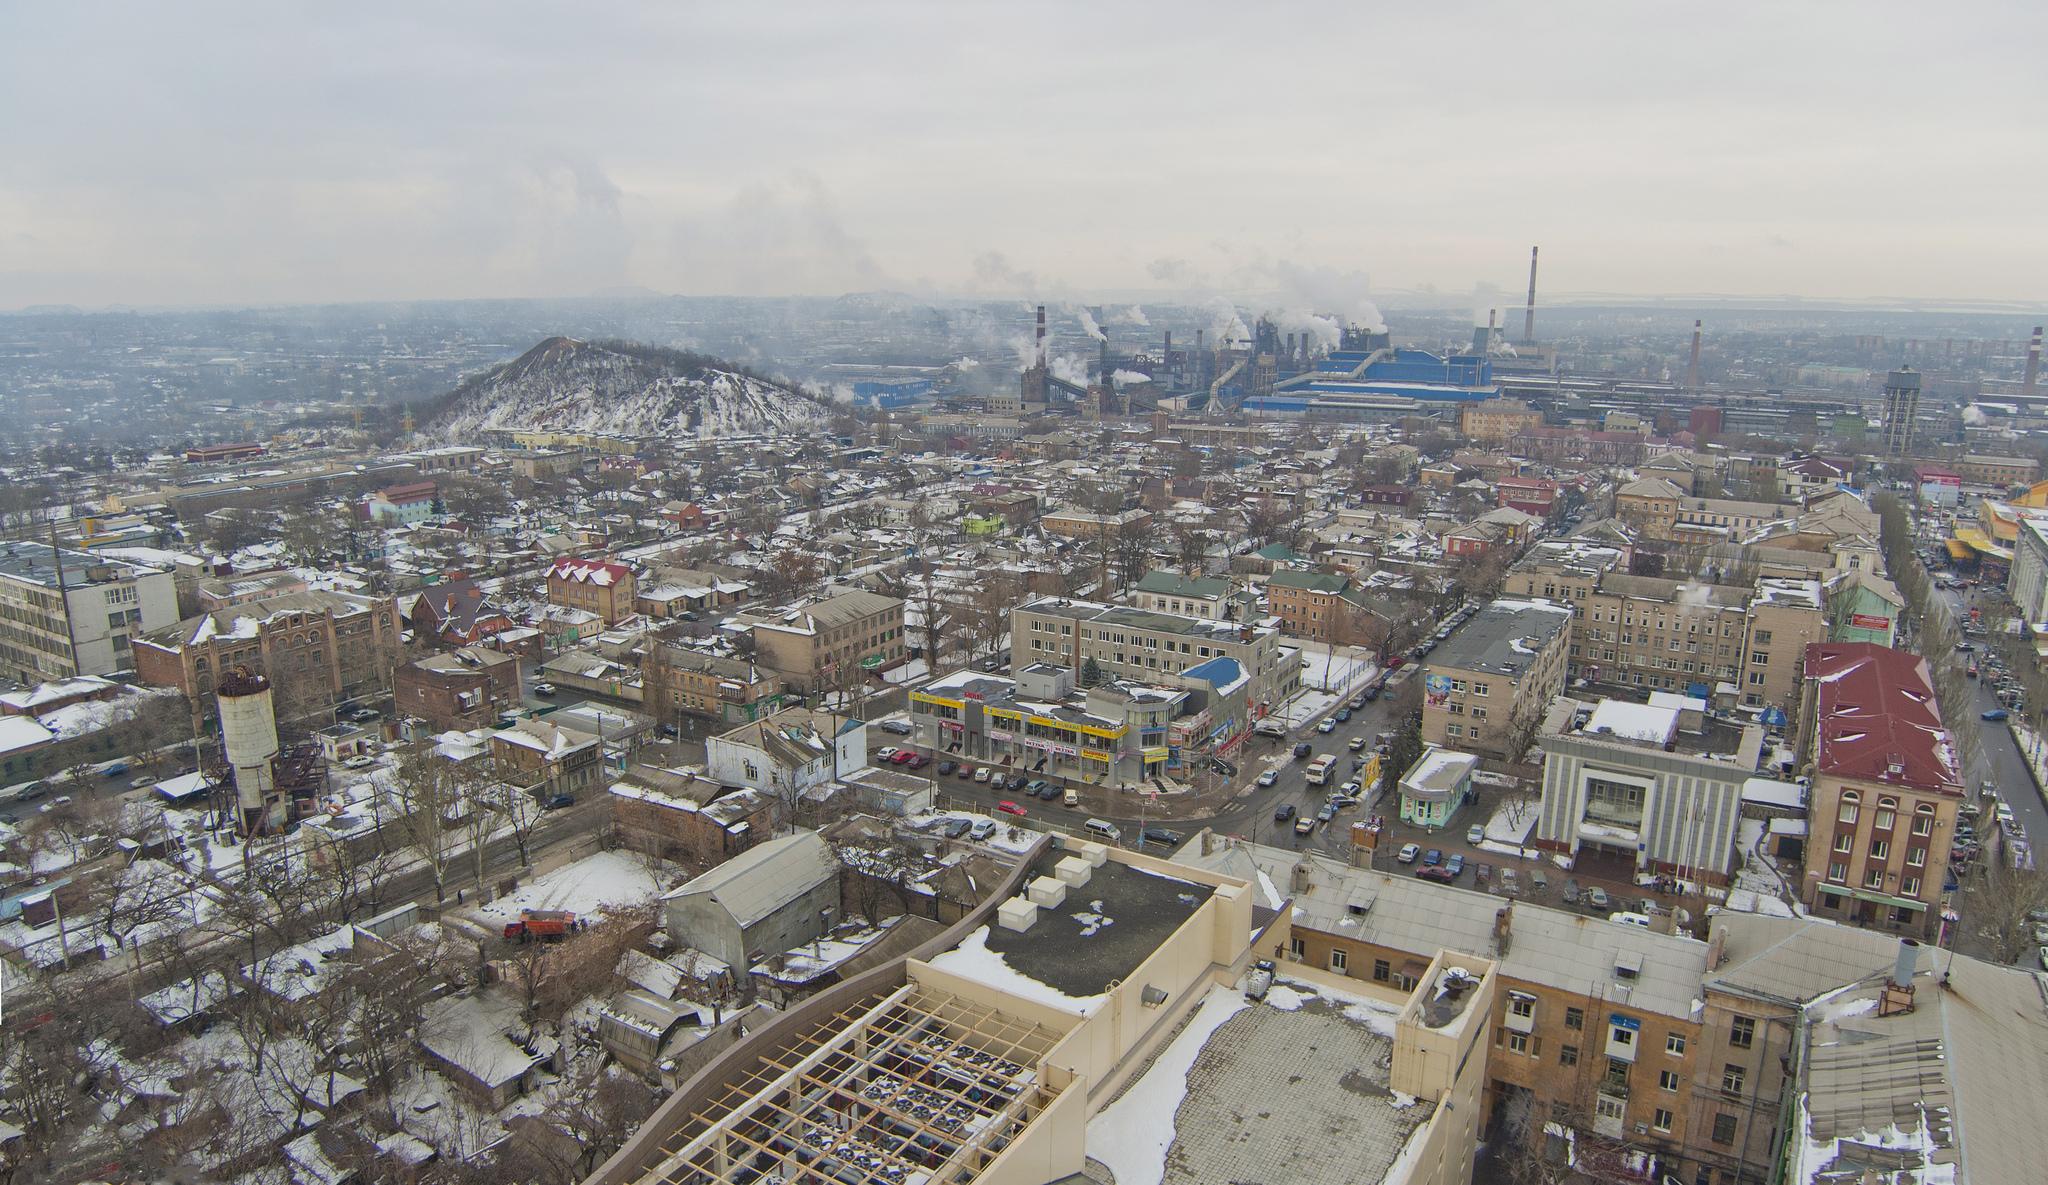 Industrial city, Donetsk